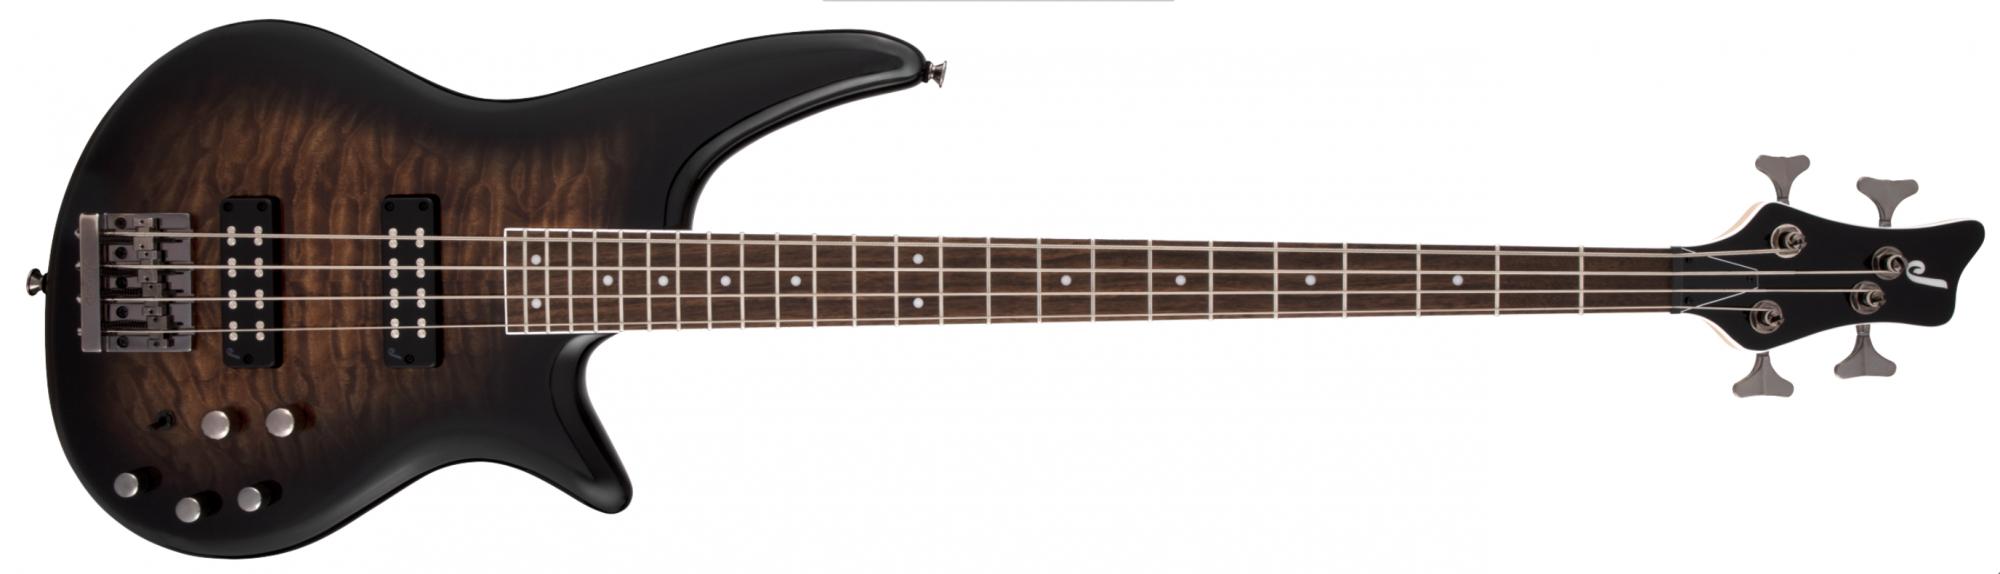 Jackson JS Series Spectra Bass JS3Q, Laurel Fingerboard, Dark Sunburst